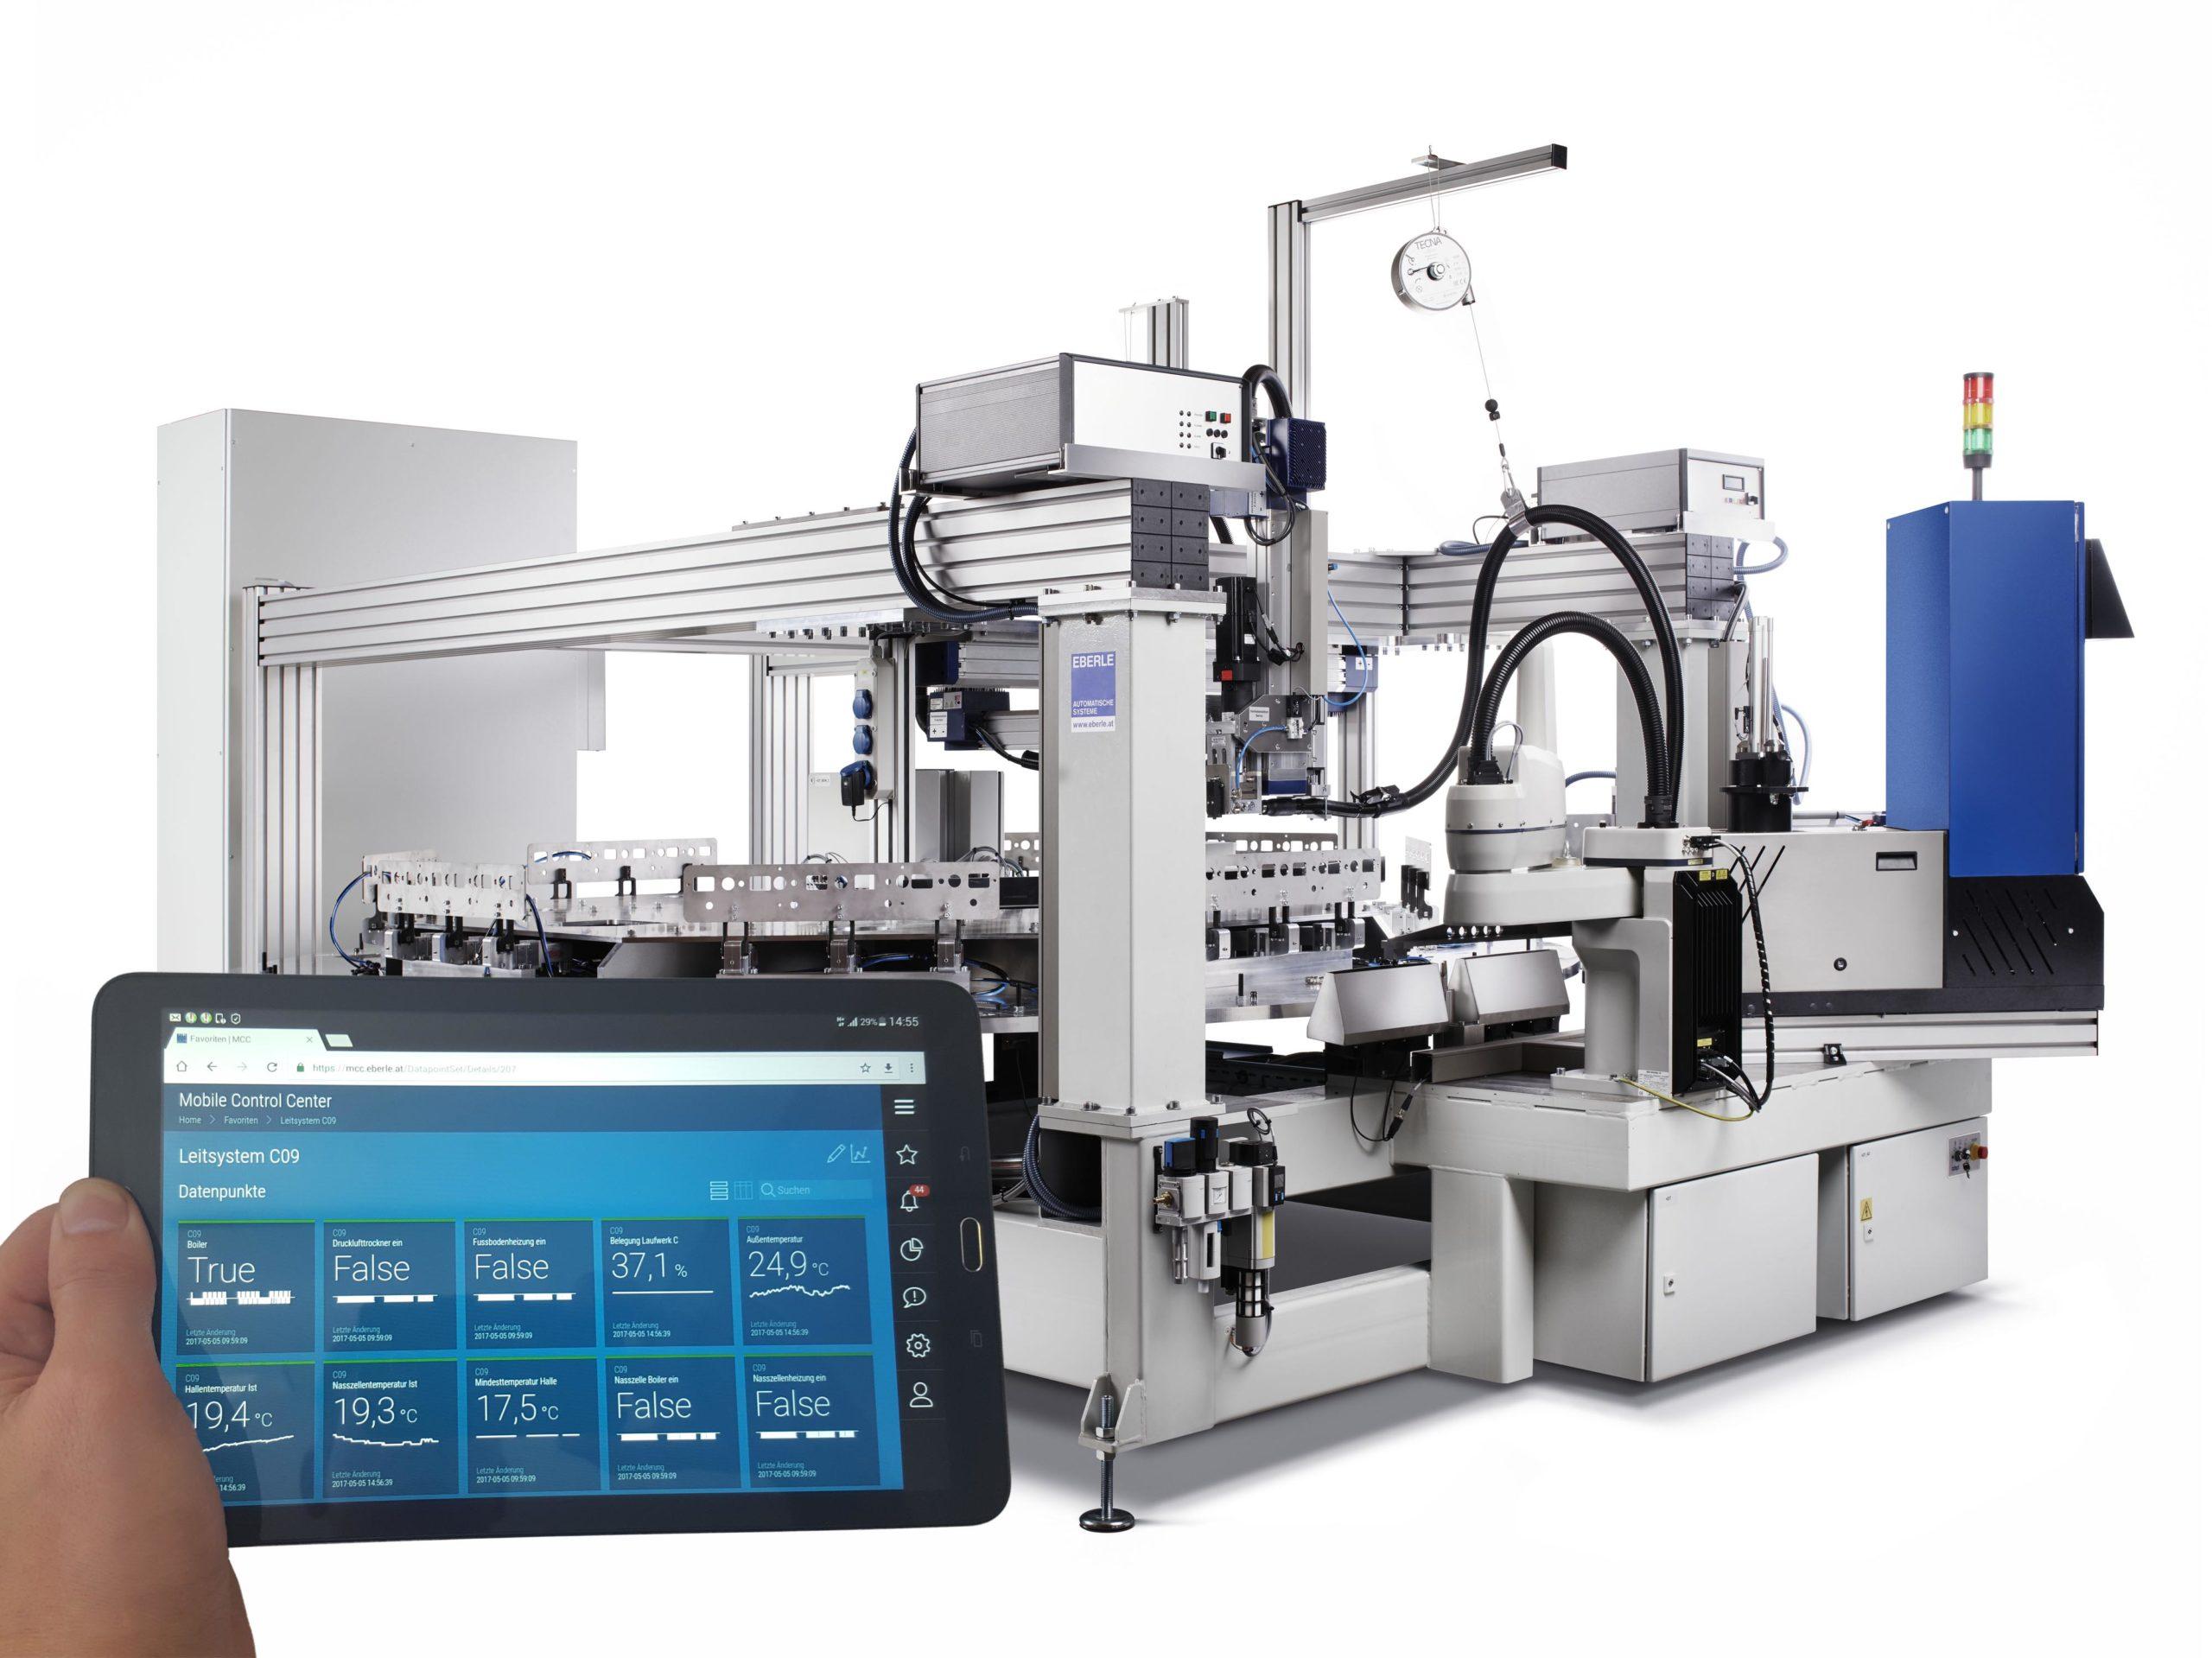 control IIoT Plattform Betriebsdatenerfassung Produktion